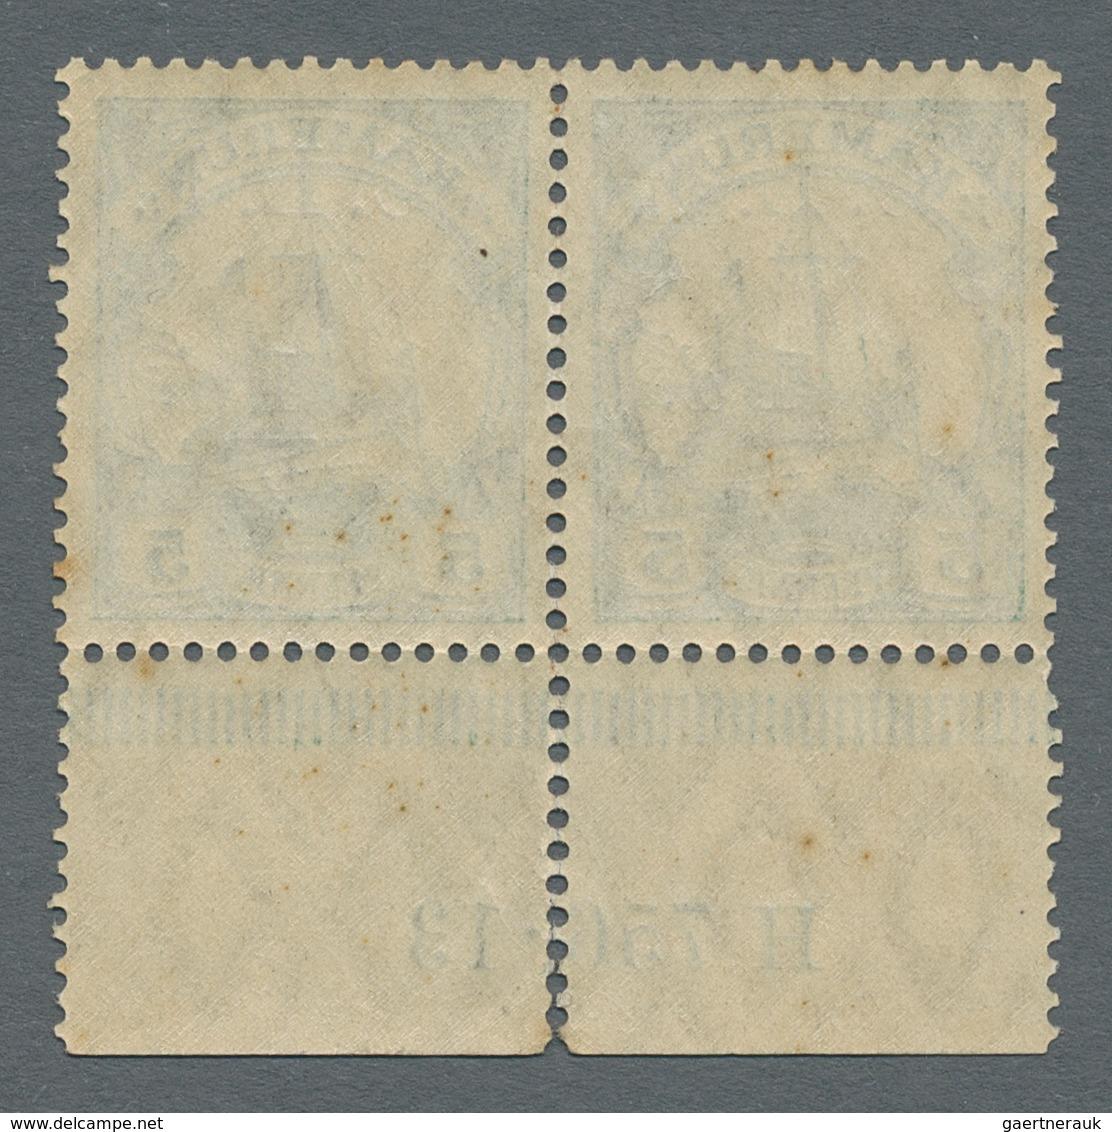 Deutsche Kolonien - Kamerun - Britische Besetzung: 1915, Britische Besetzung Michel Nummer 2 Mit HAN - Kolonie: Kamerun